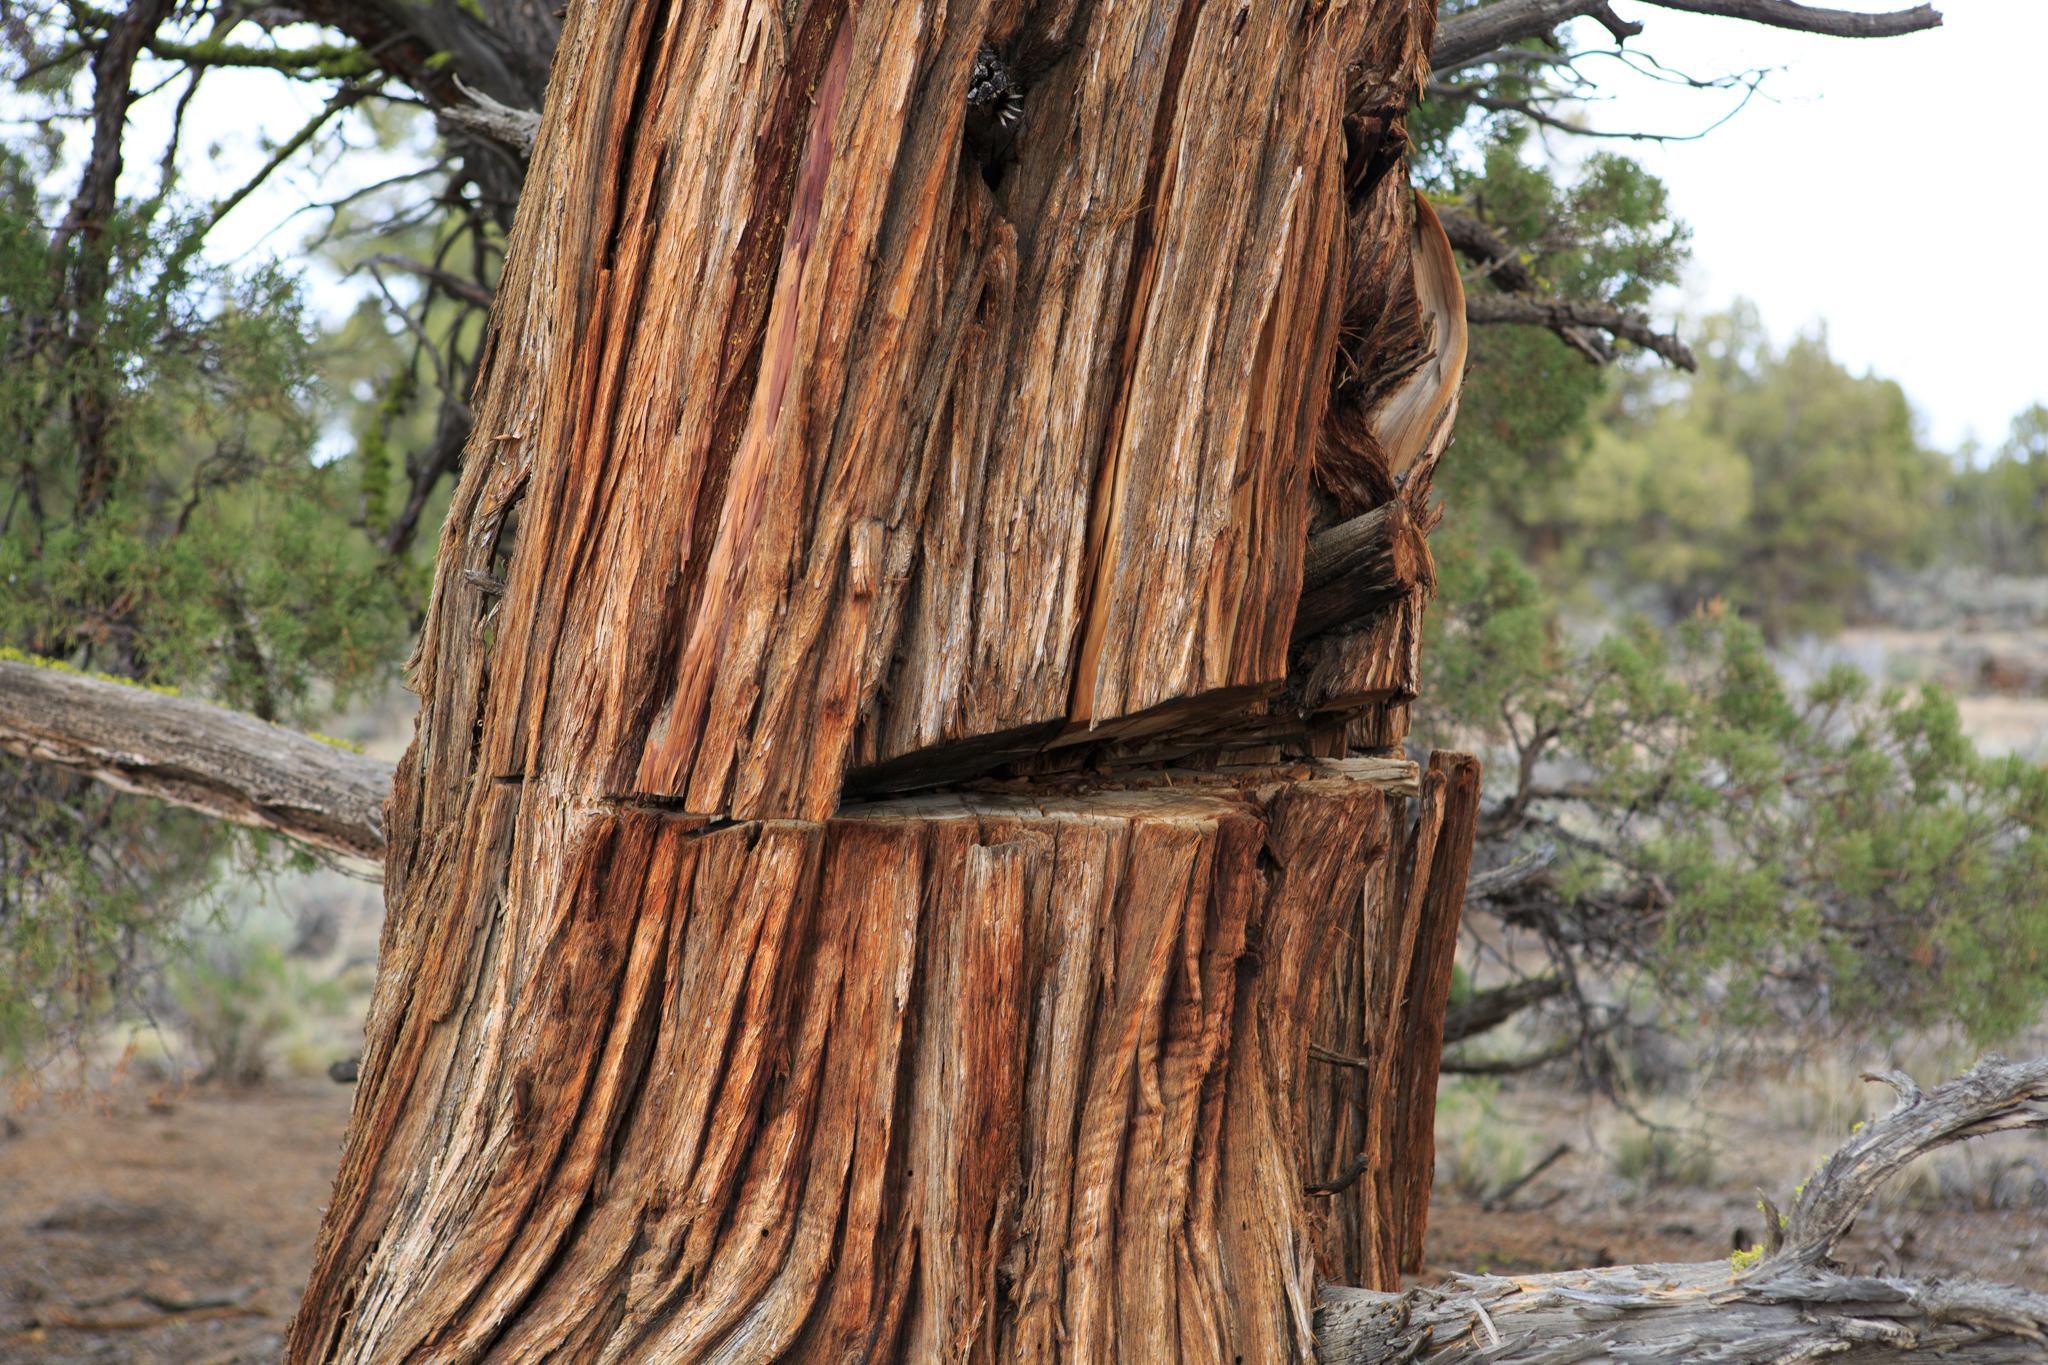 A juniper tree bears the mark of an attempted cutting.